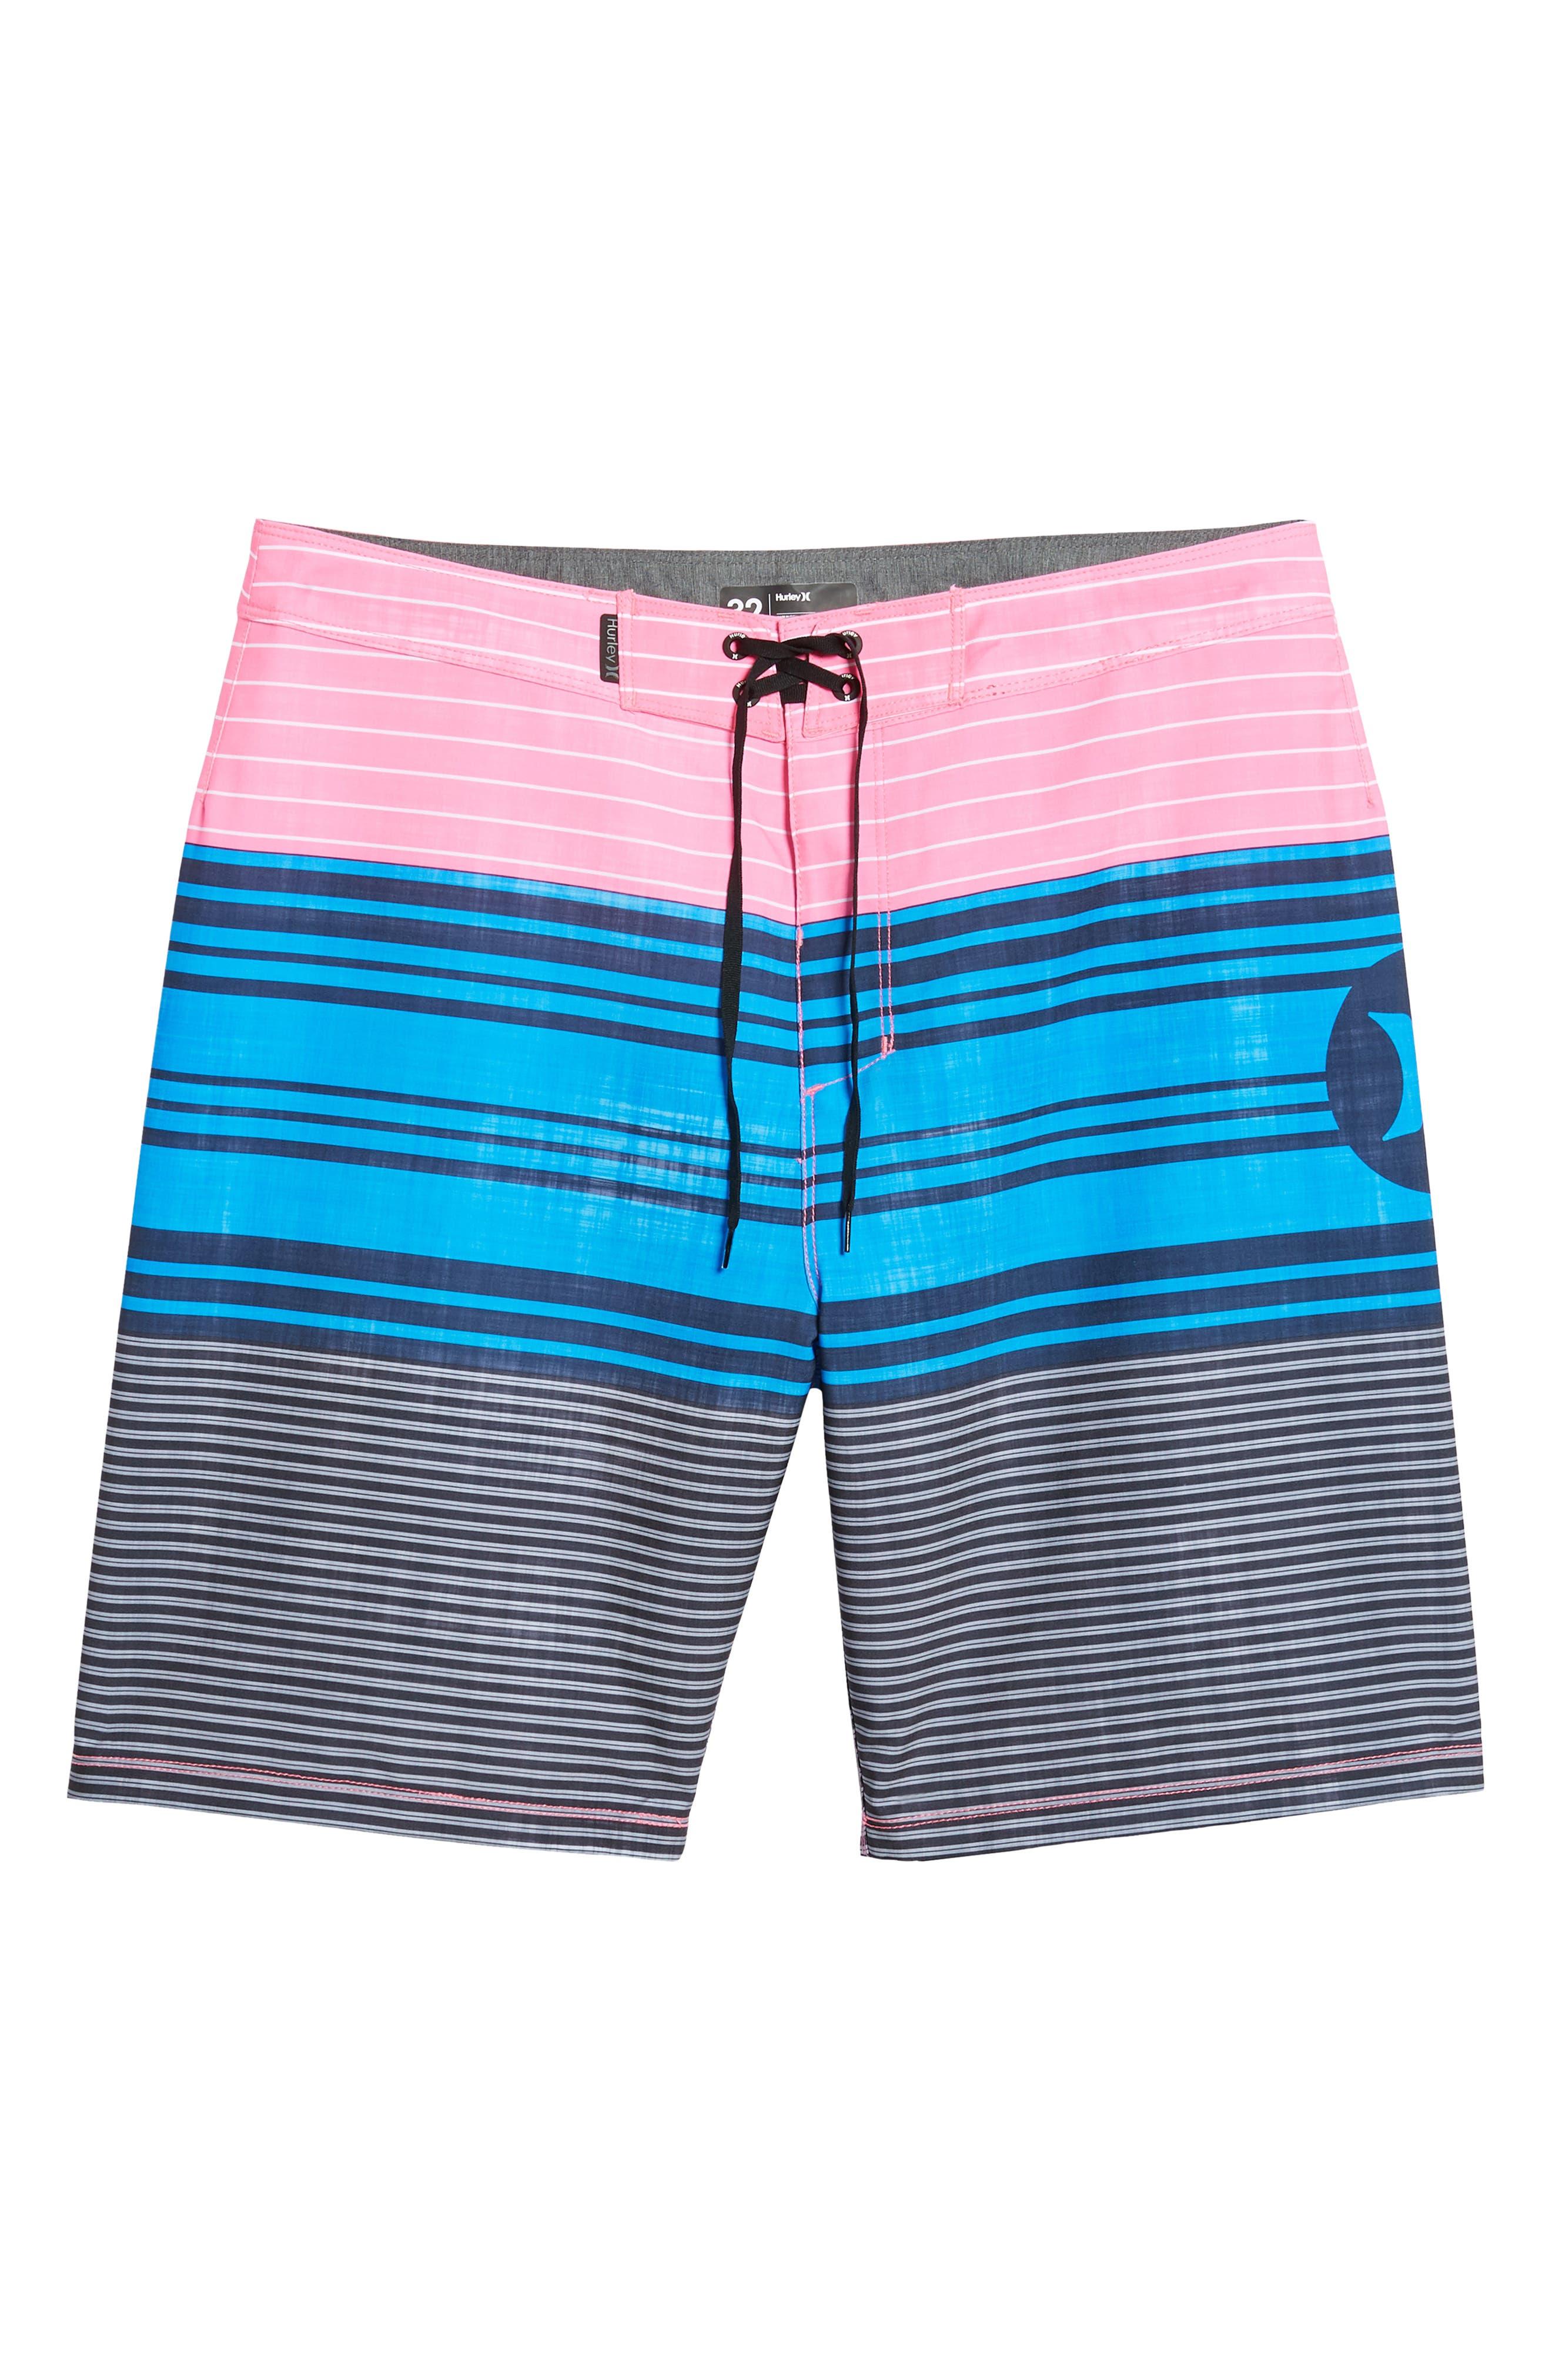 Strands Board Shorts,                             Alternate thumbnail 6, color,                             Photo Blue